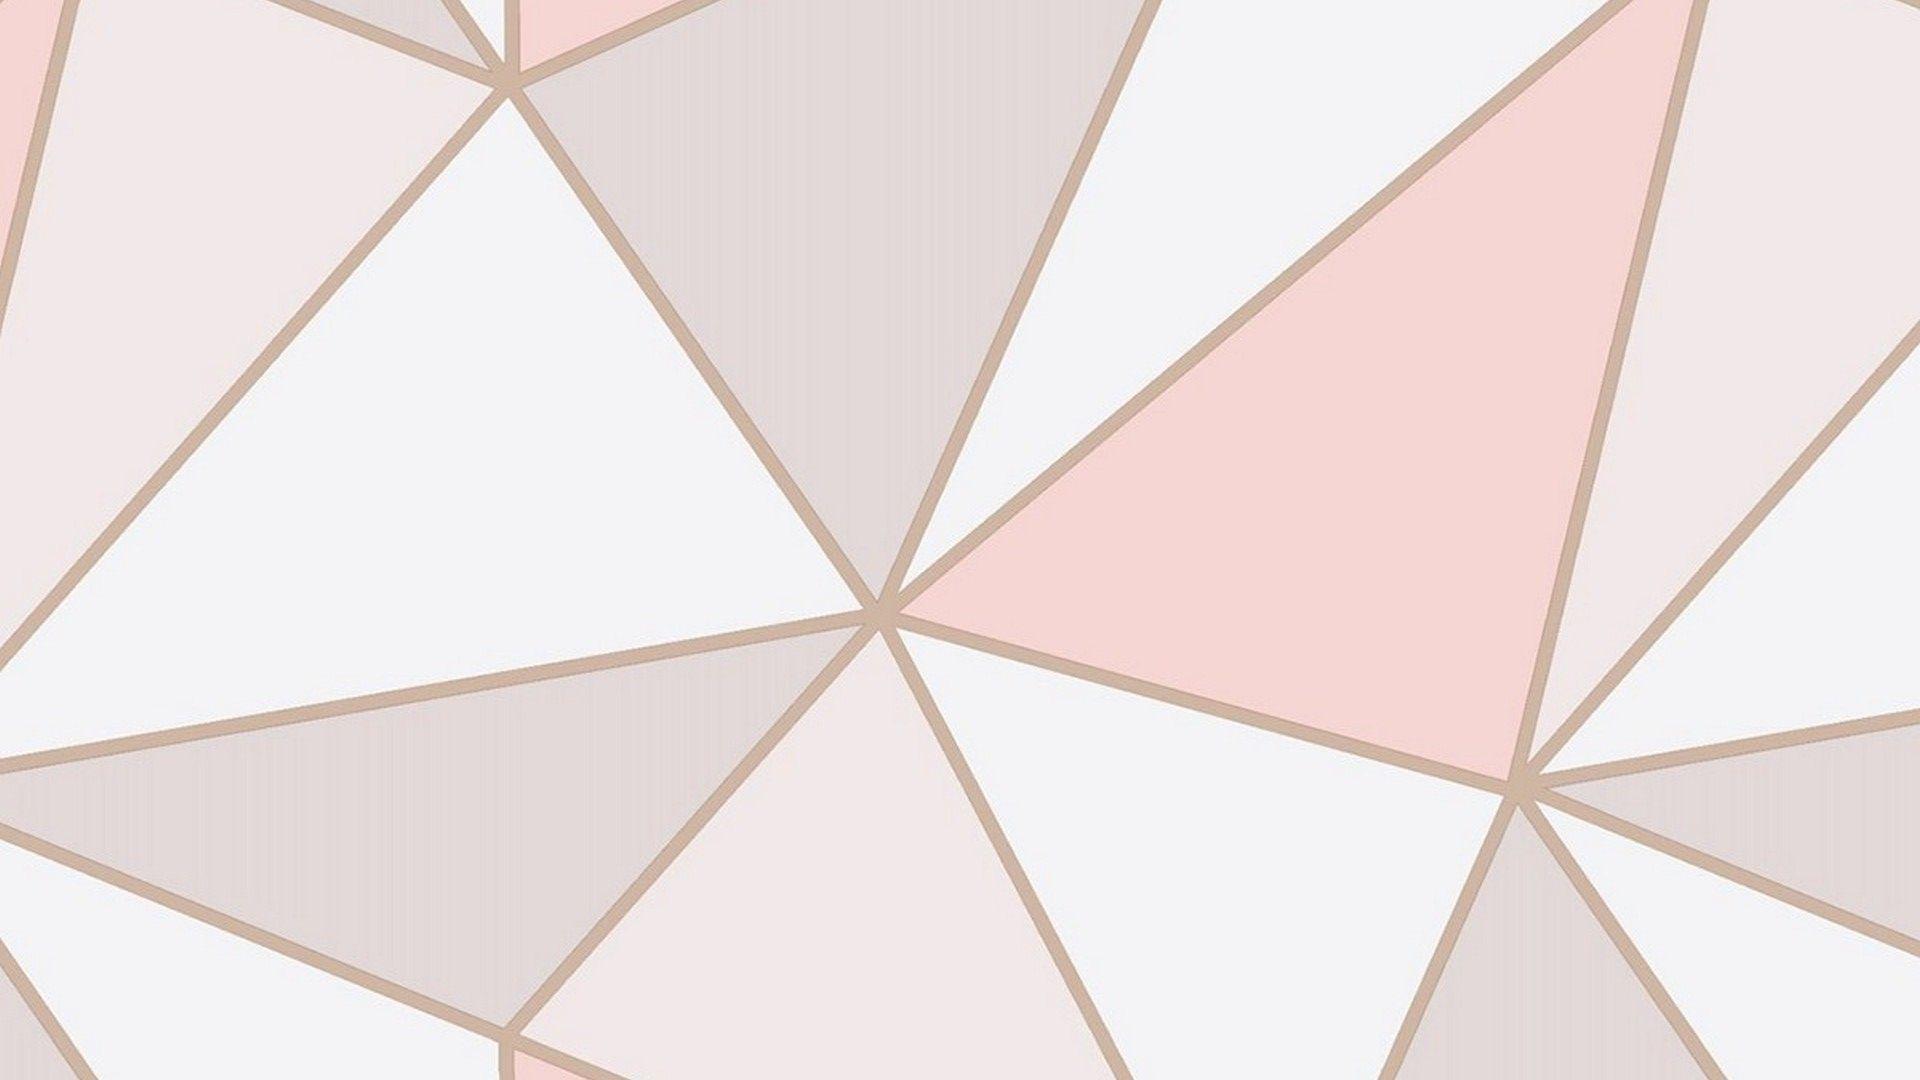 Desktop Pinterest Rose Gold Wallpapers - Wallpaper Cave